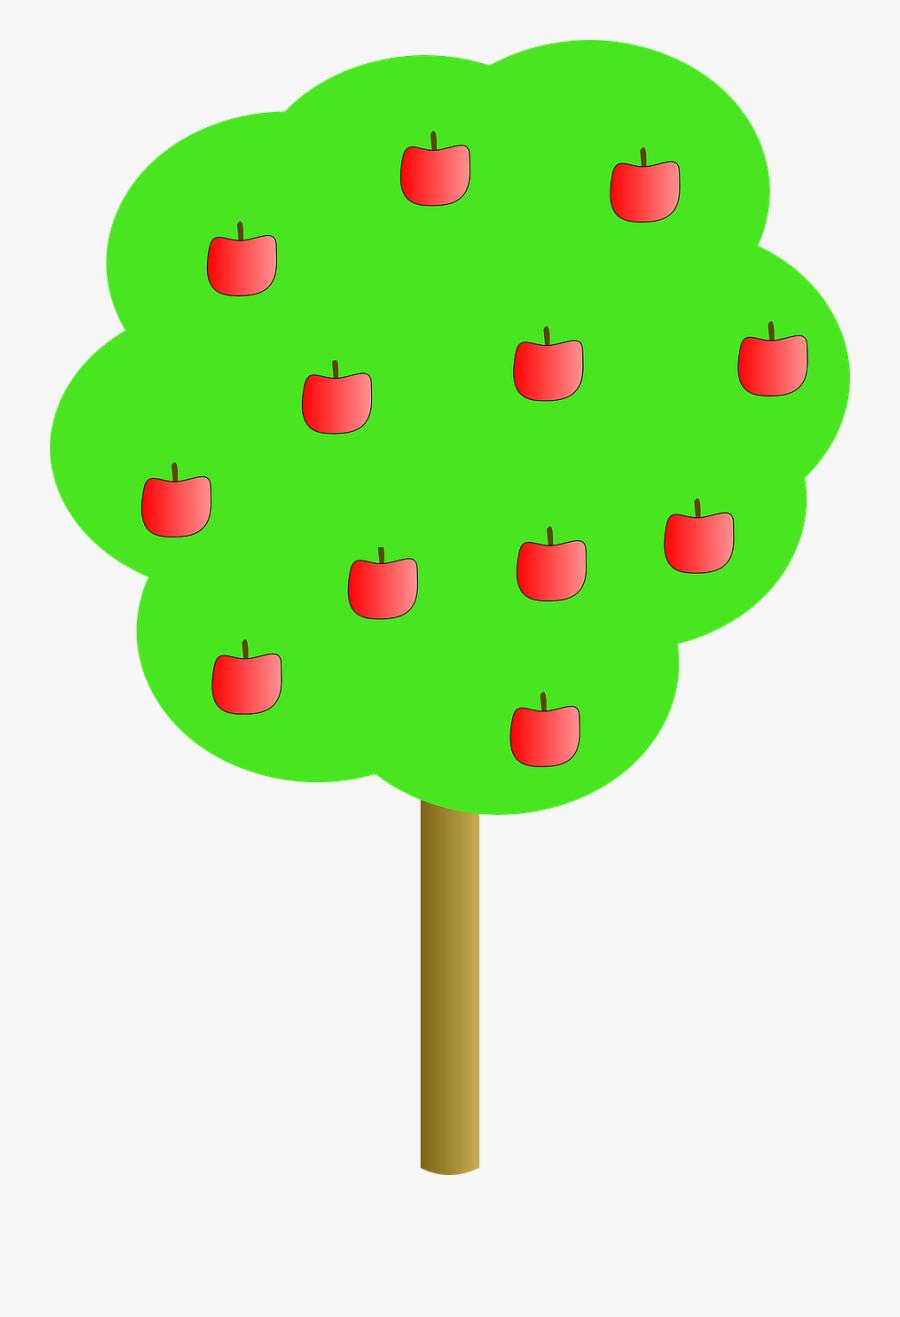 Apple, Tree, Apples, Red - Apple Tree Clip Art, Transparent Clipart